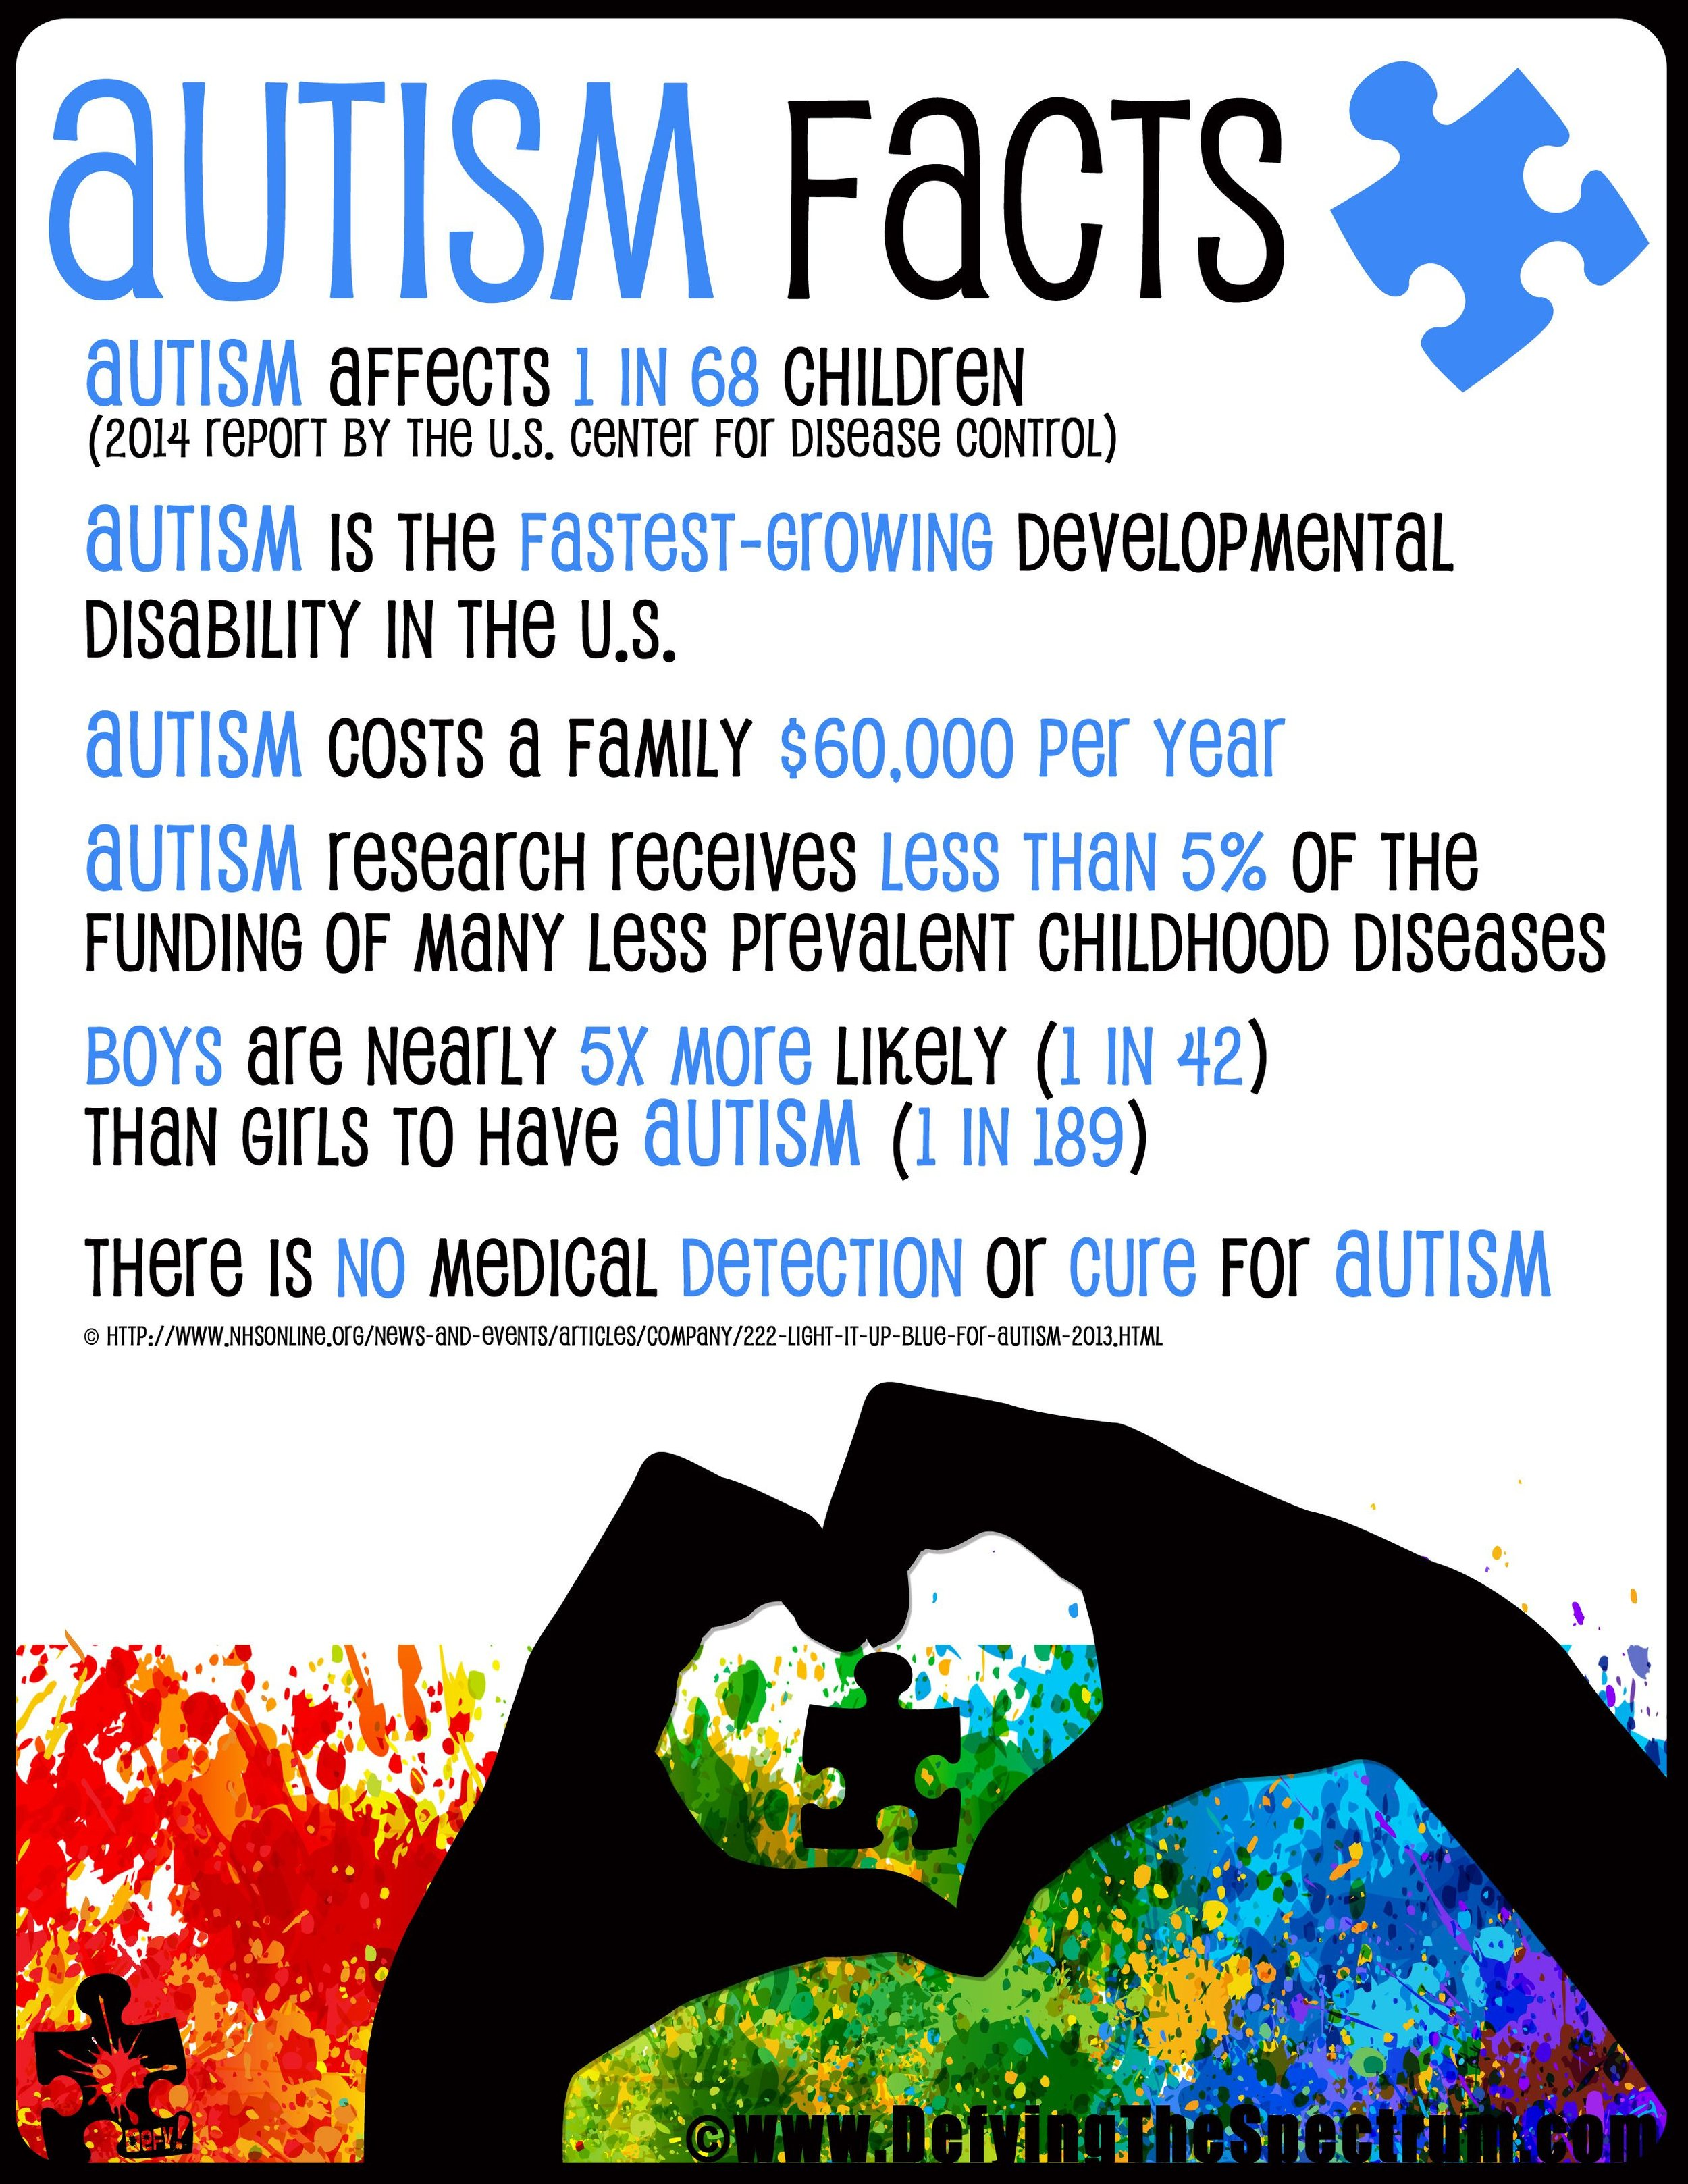 austism facts 2.jpg